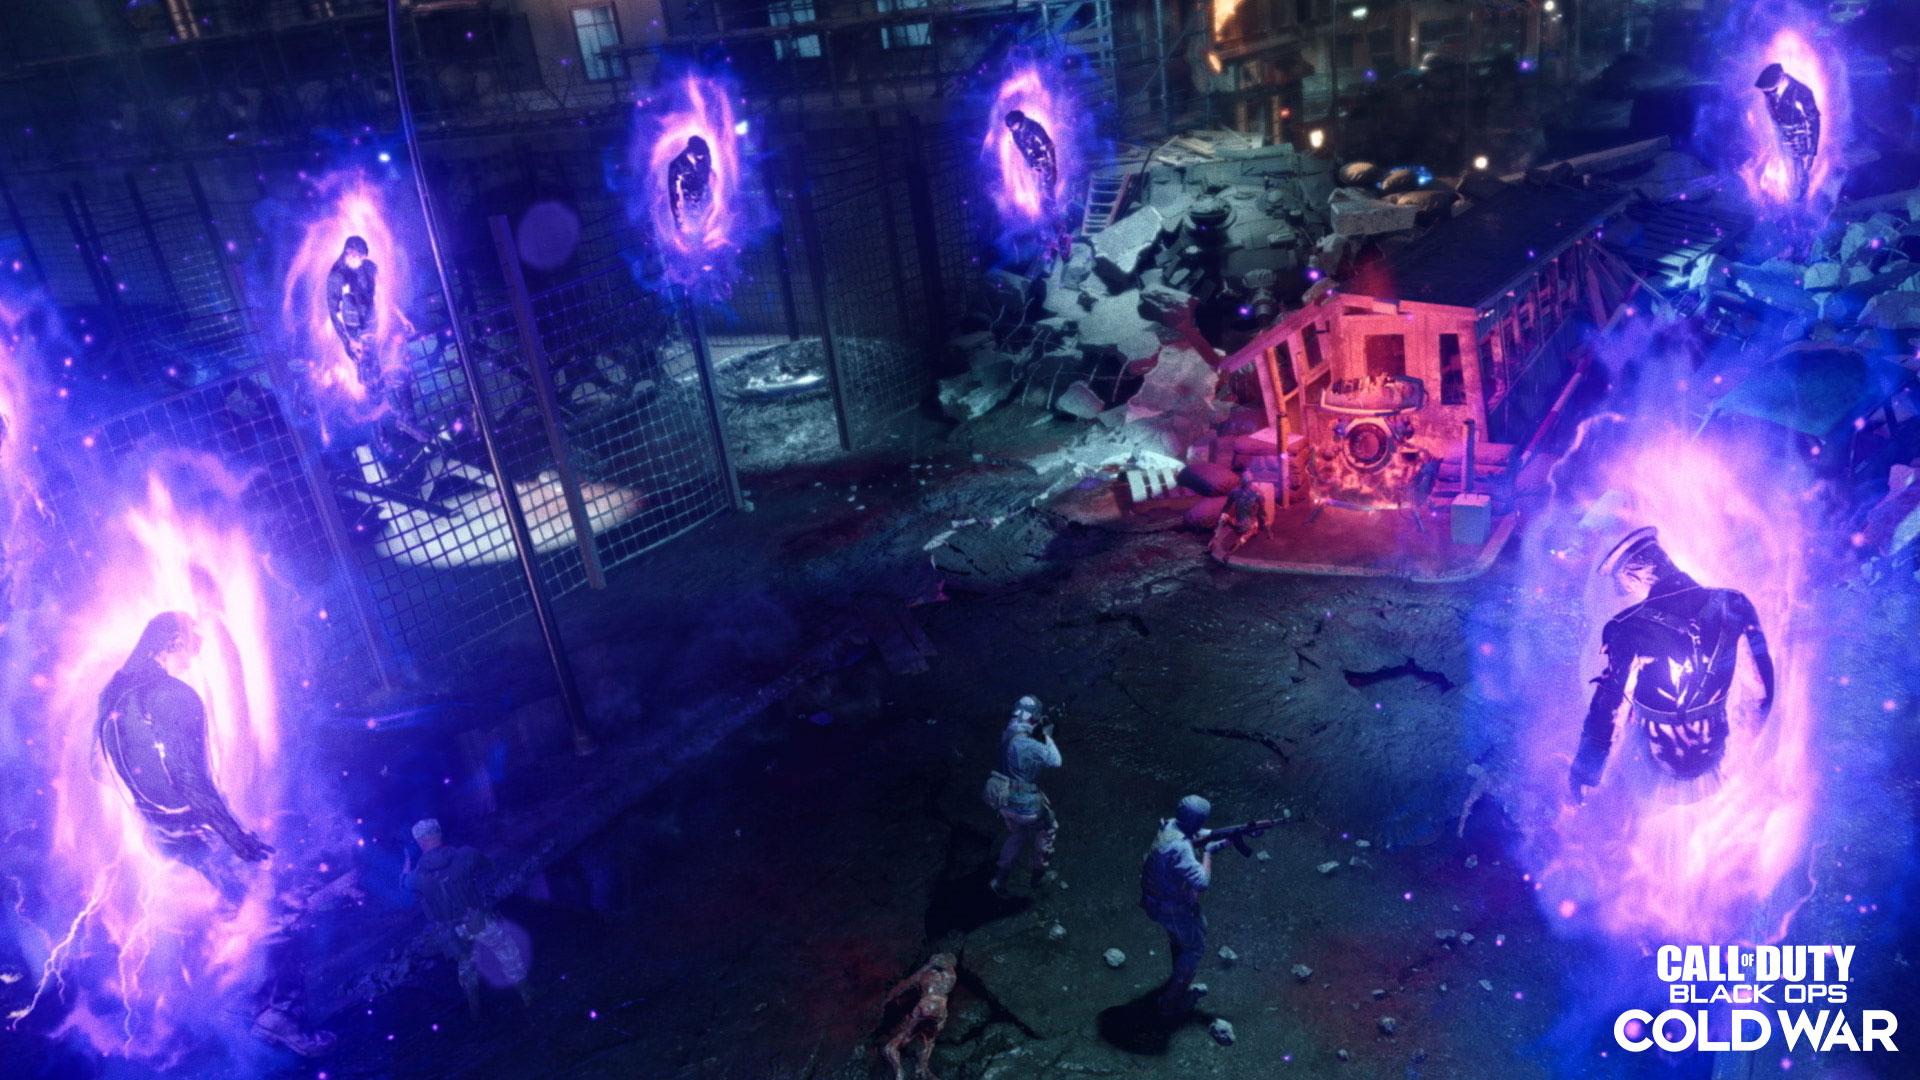 Purple glowing zombies